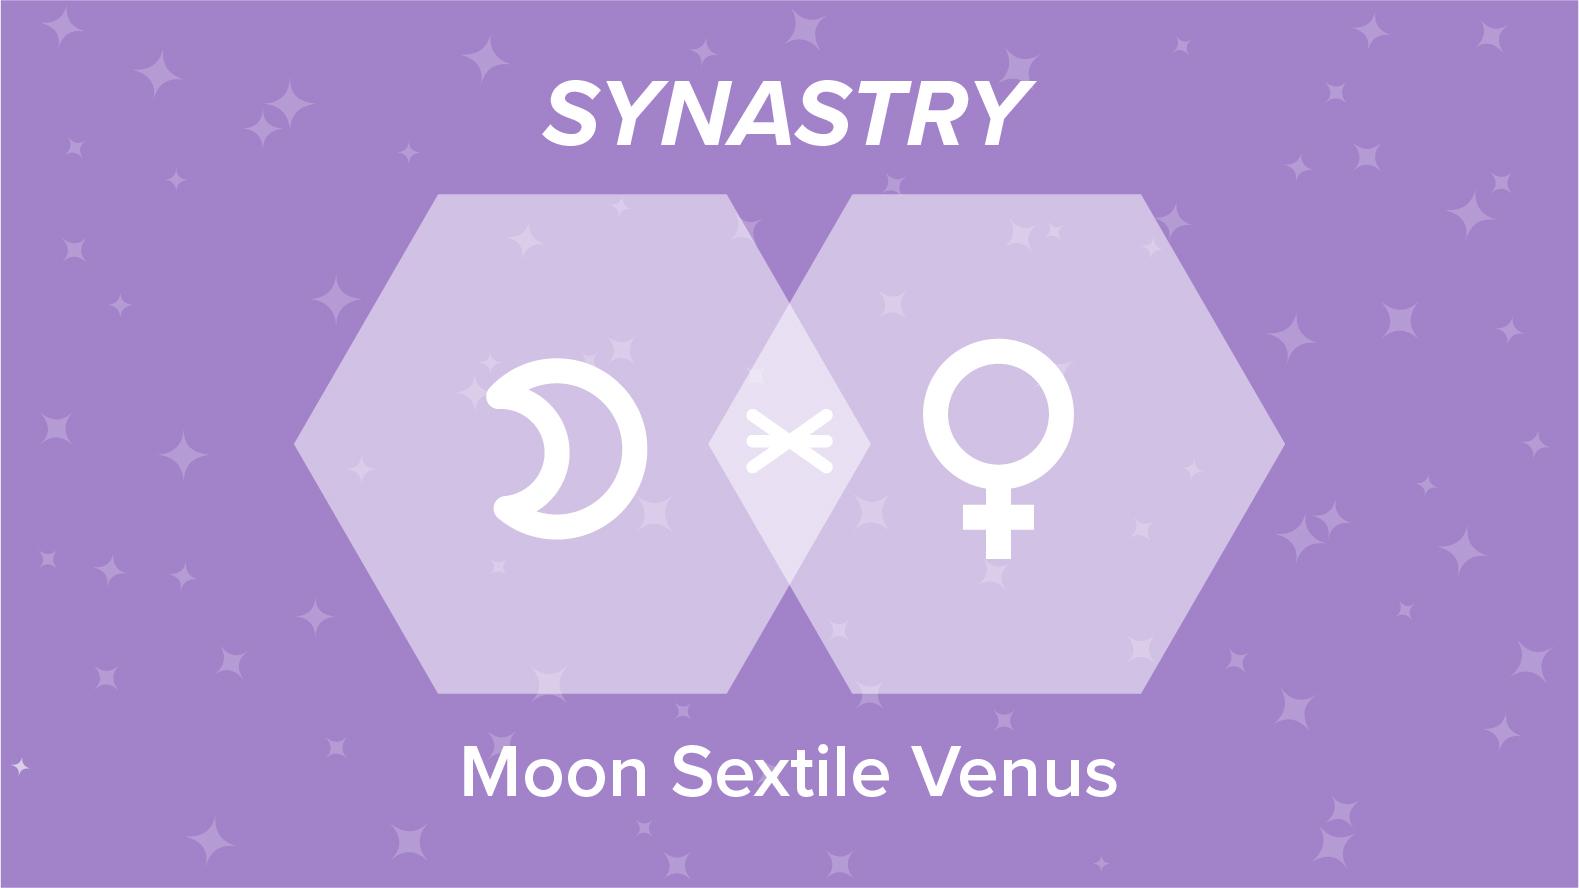 Moon Sextile Venus Synastry